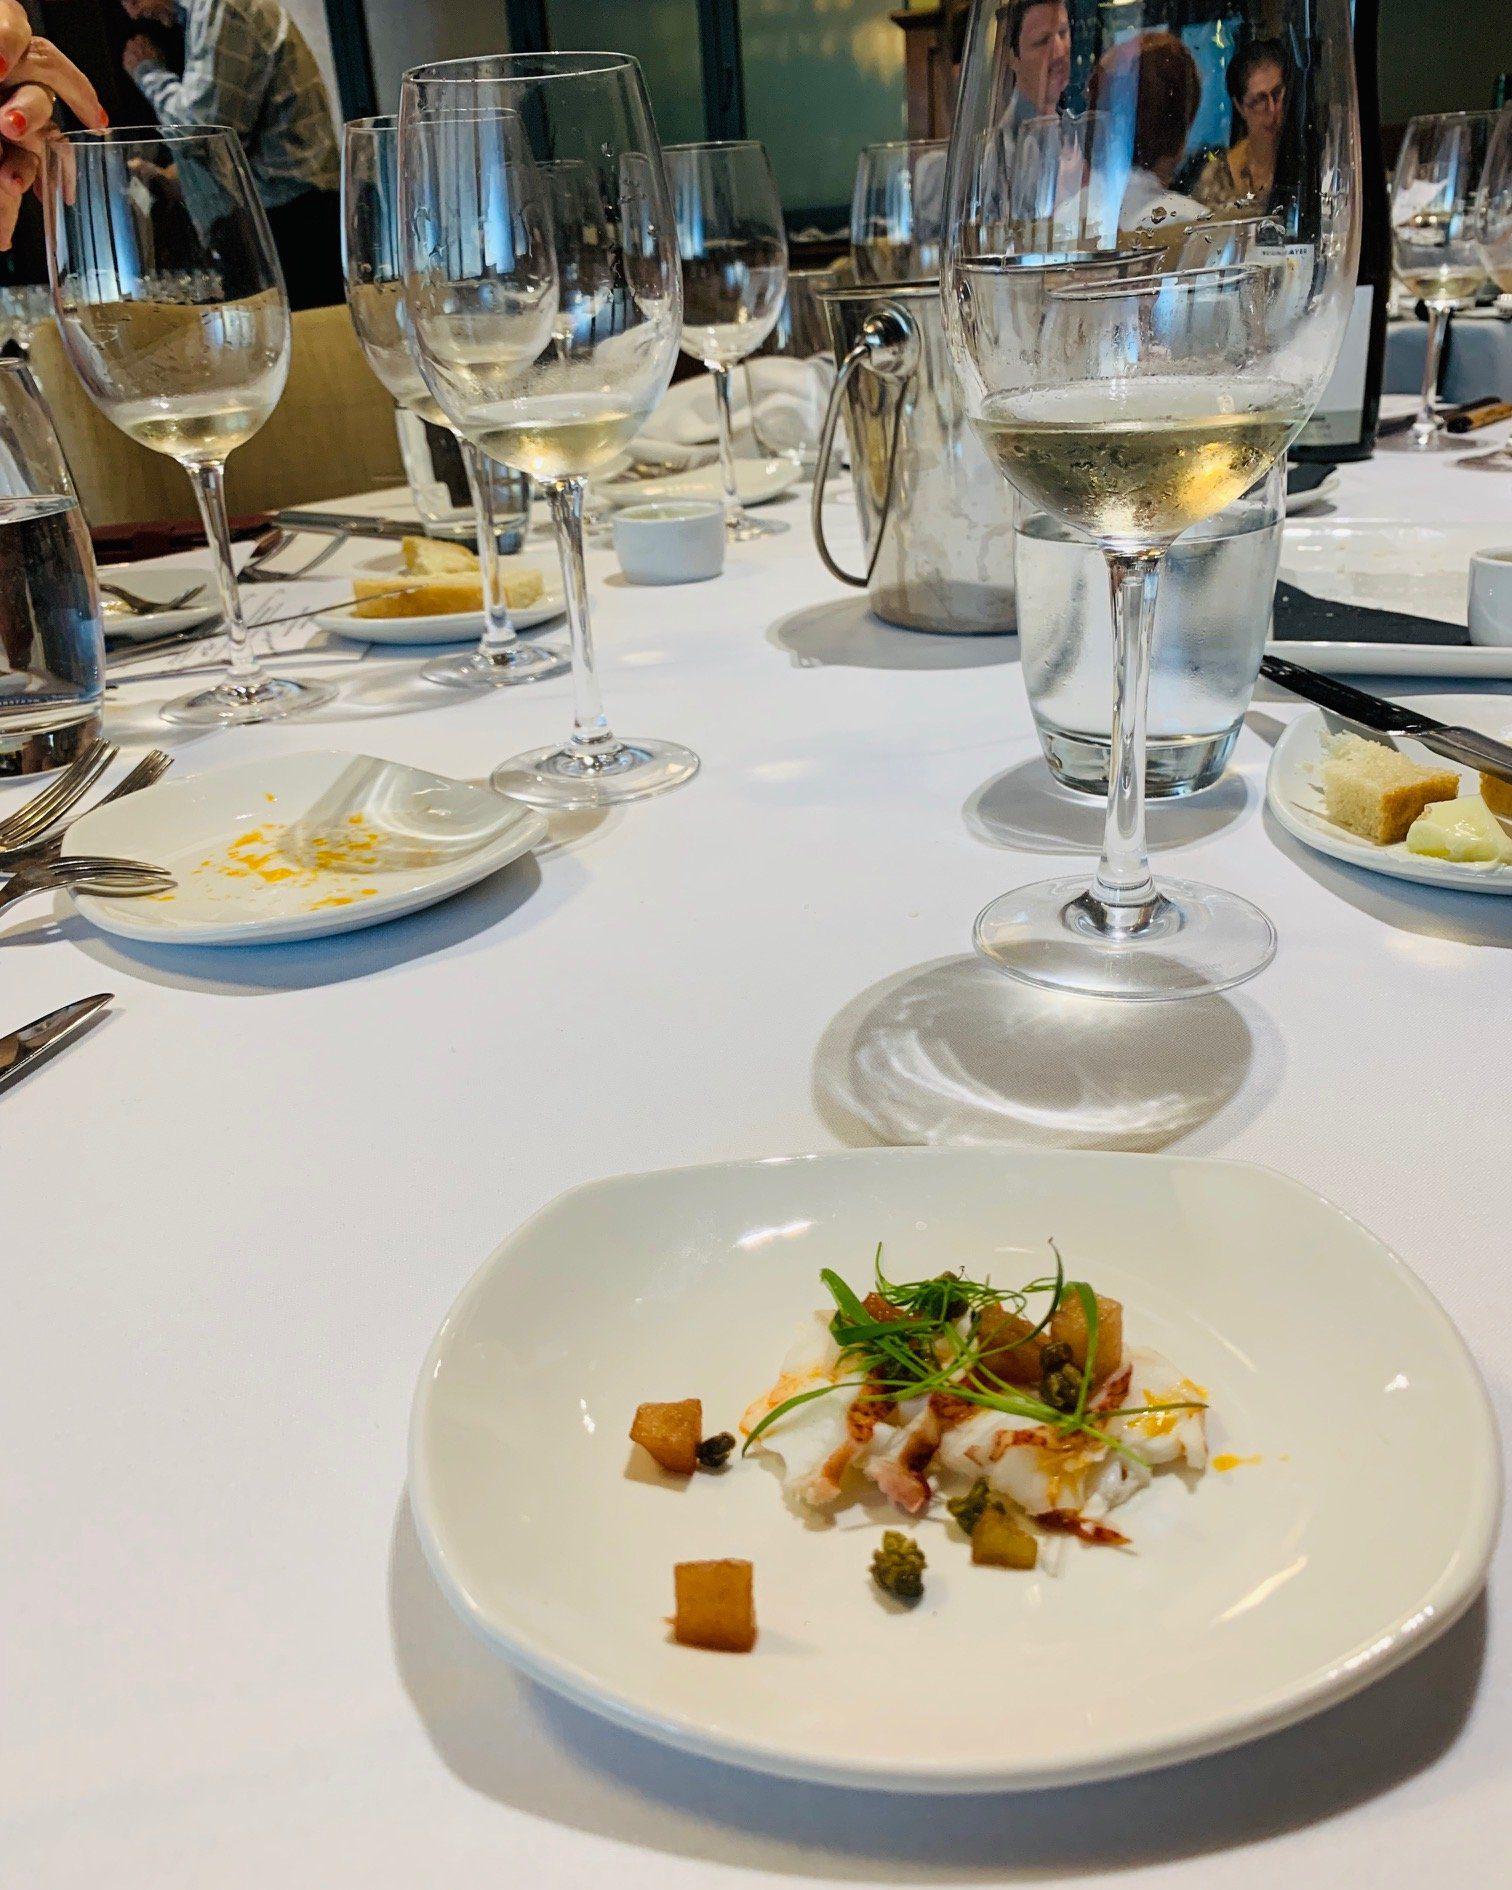 food and wine pairings Lobster Carpaccio